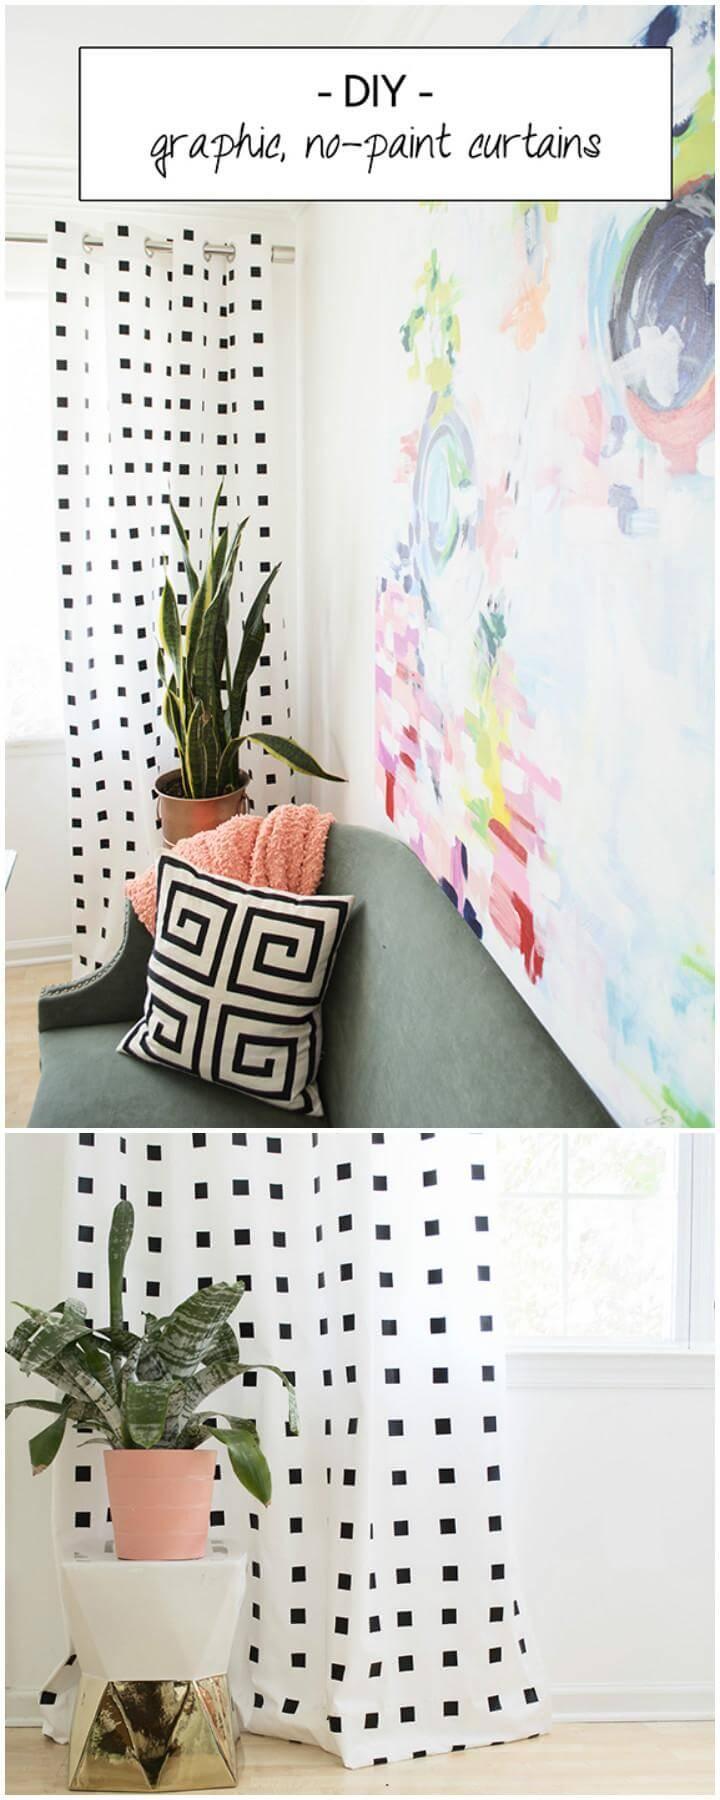 DIY Homemade No-Paint Curtains